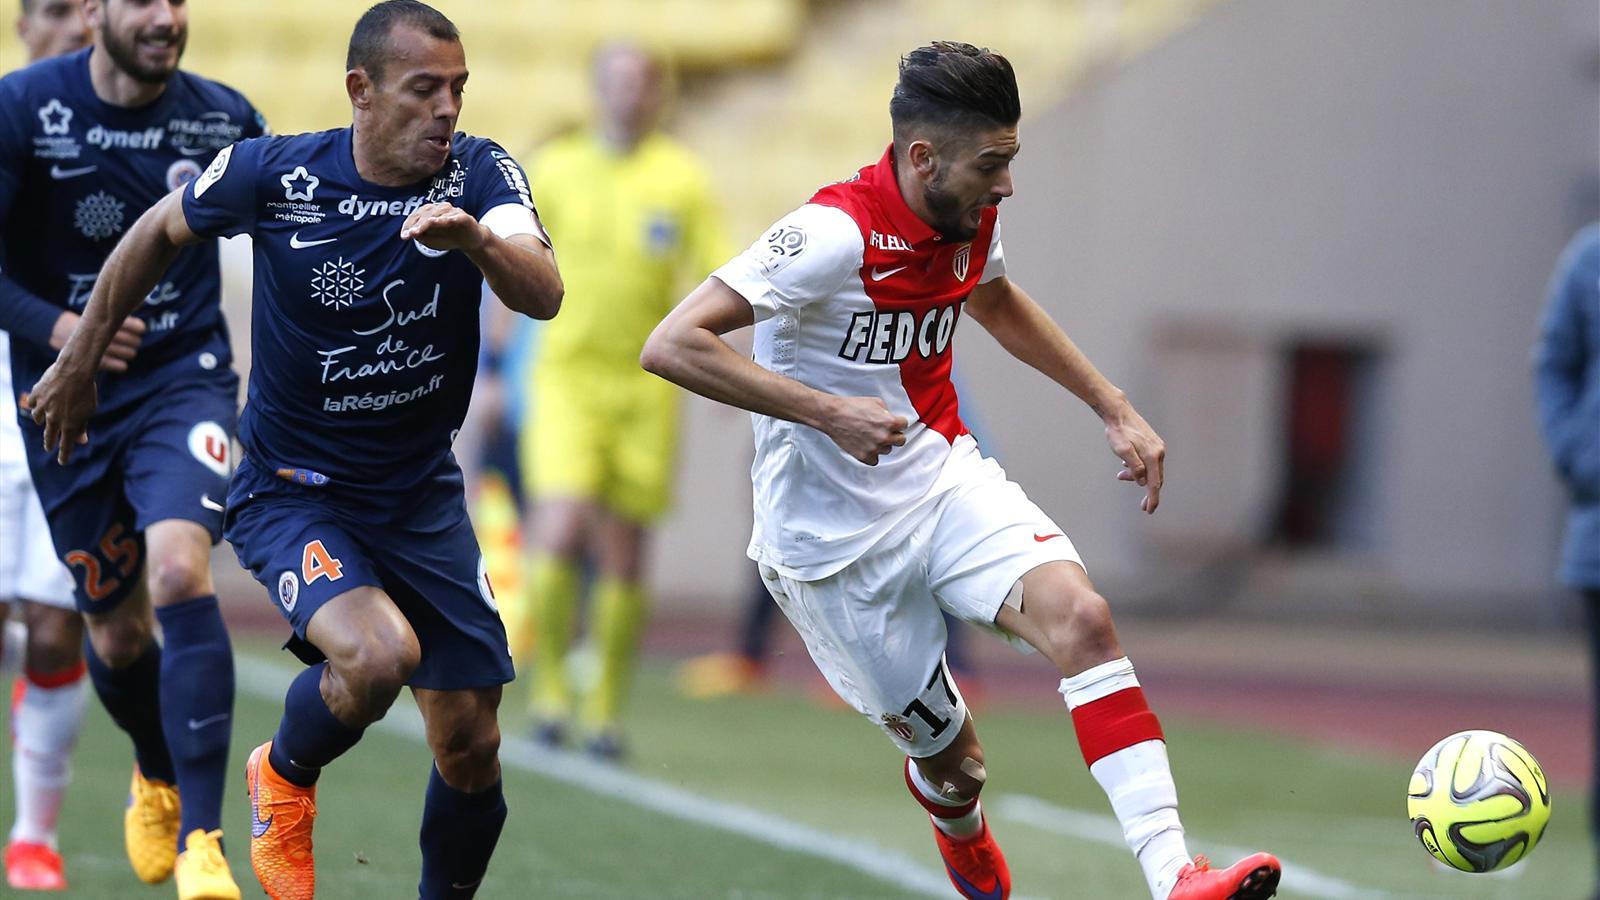 Video: Monaco vs Montpellier